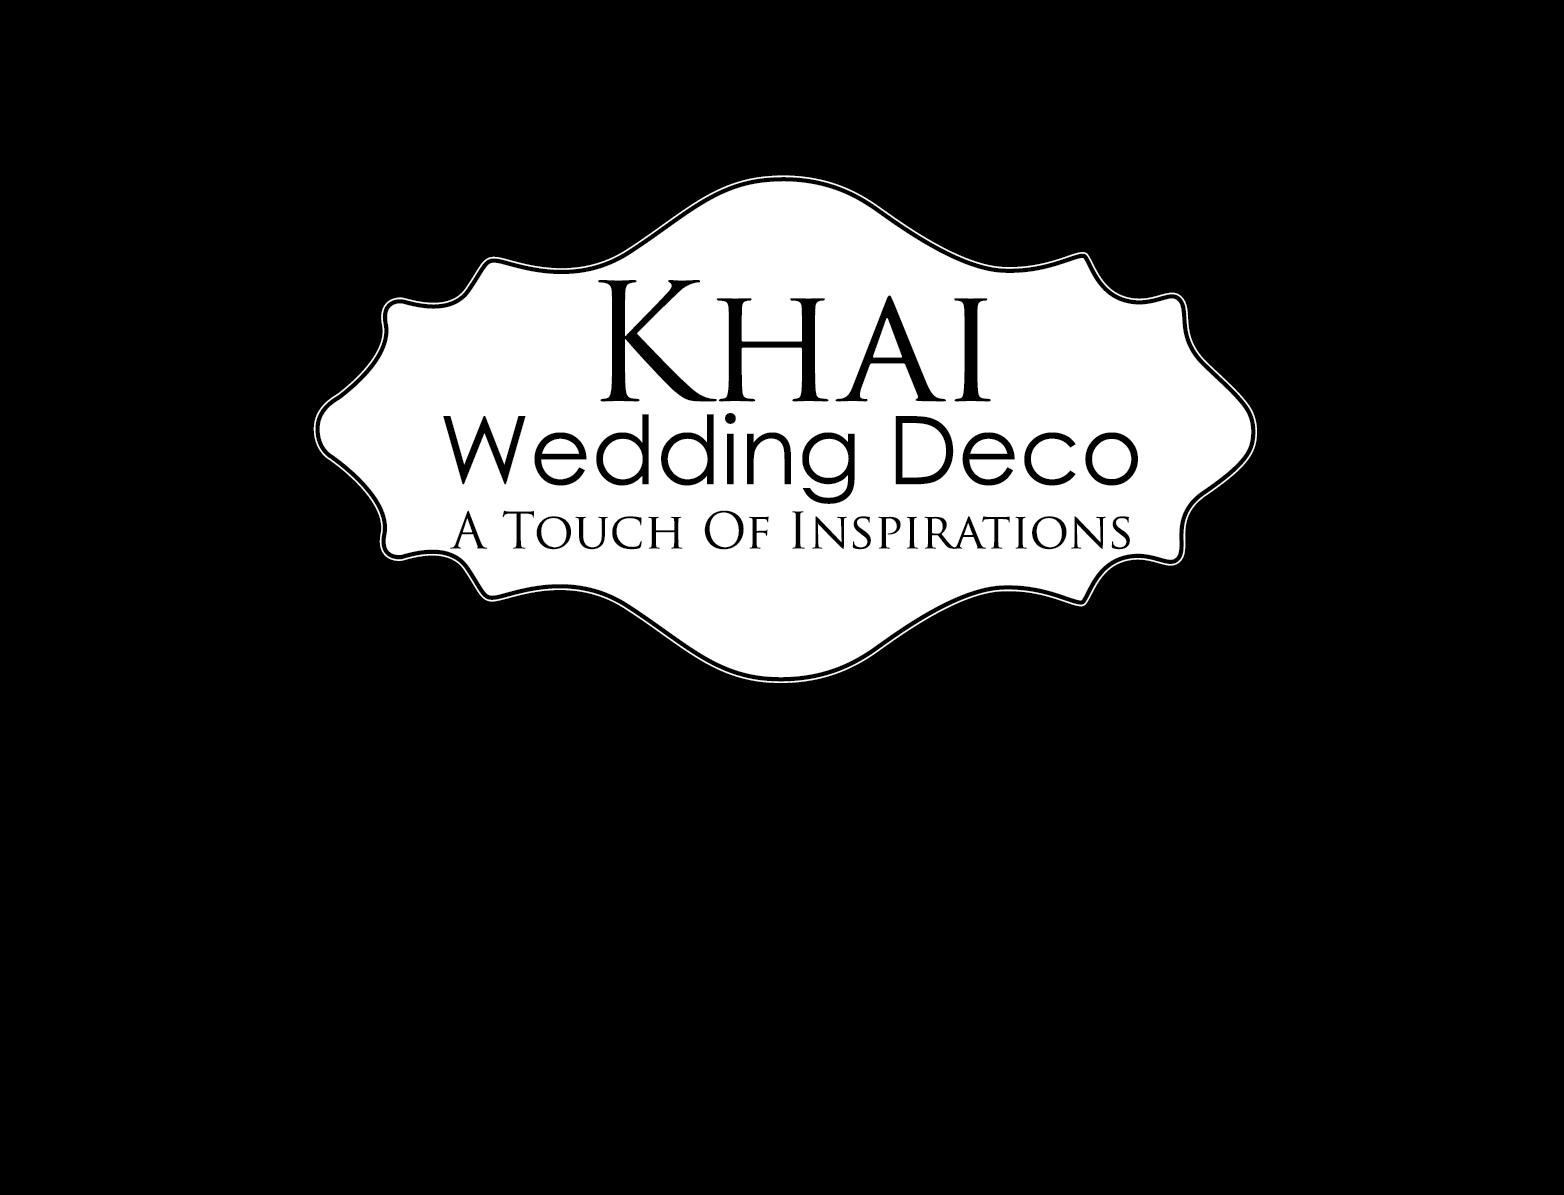 BLACK BOW DIARIES: KHAI WEDDING DECO